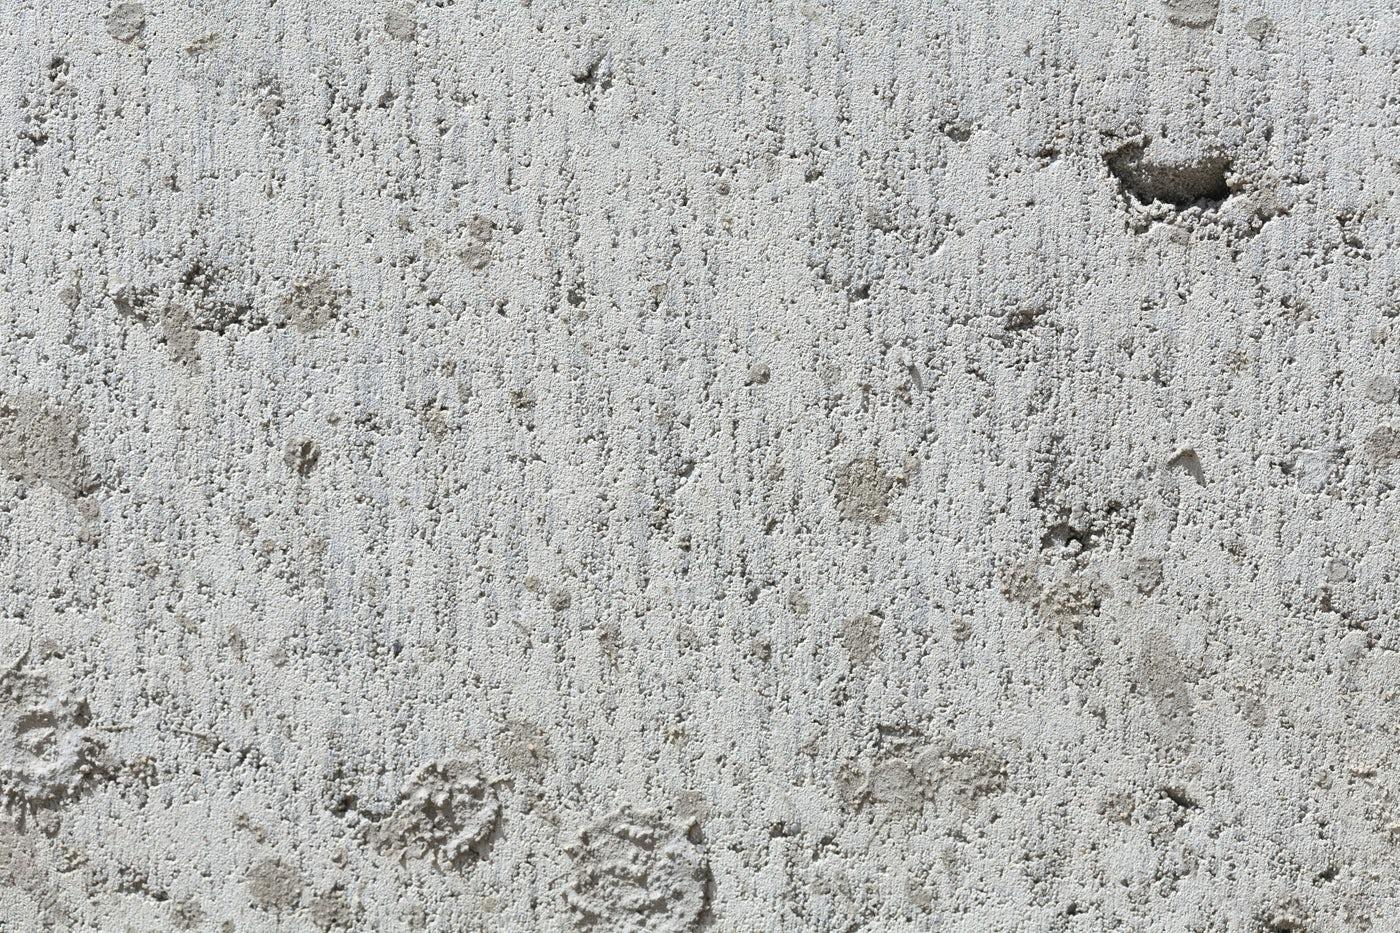 White Plaster On The Wall: Stock Photos